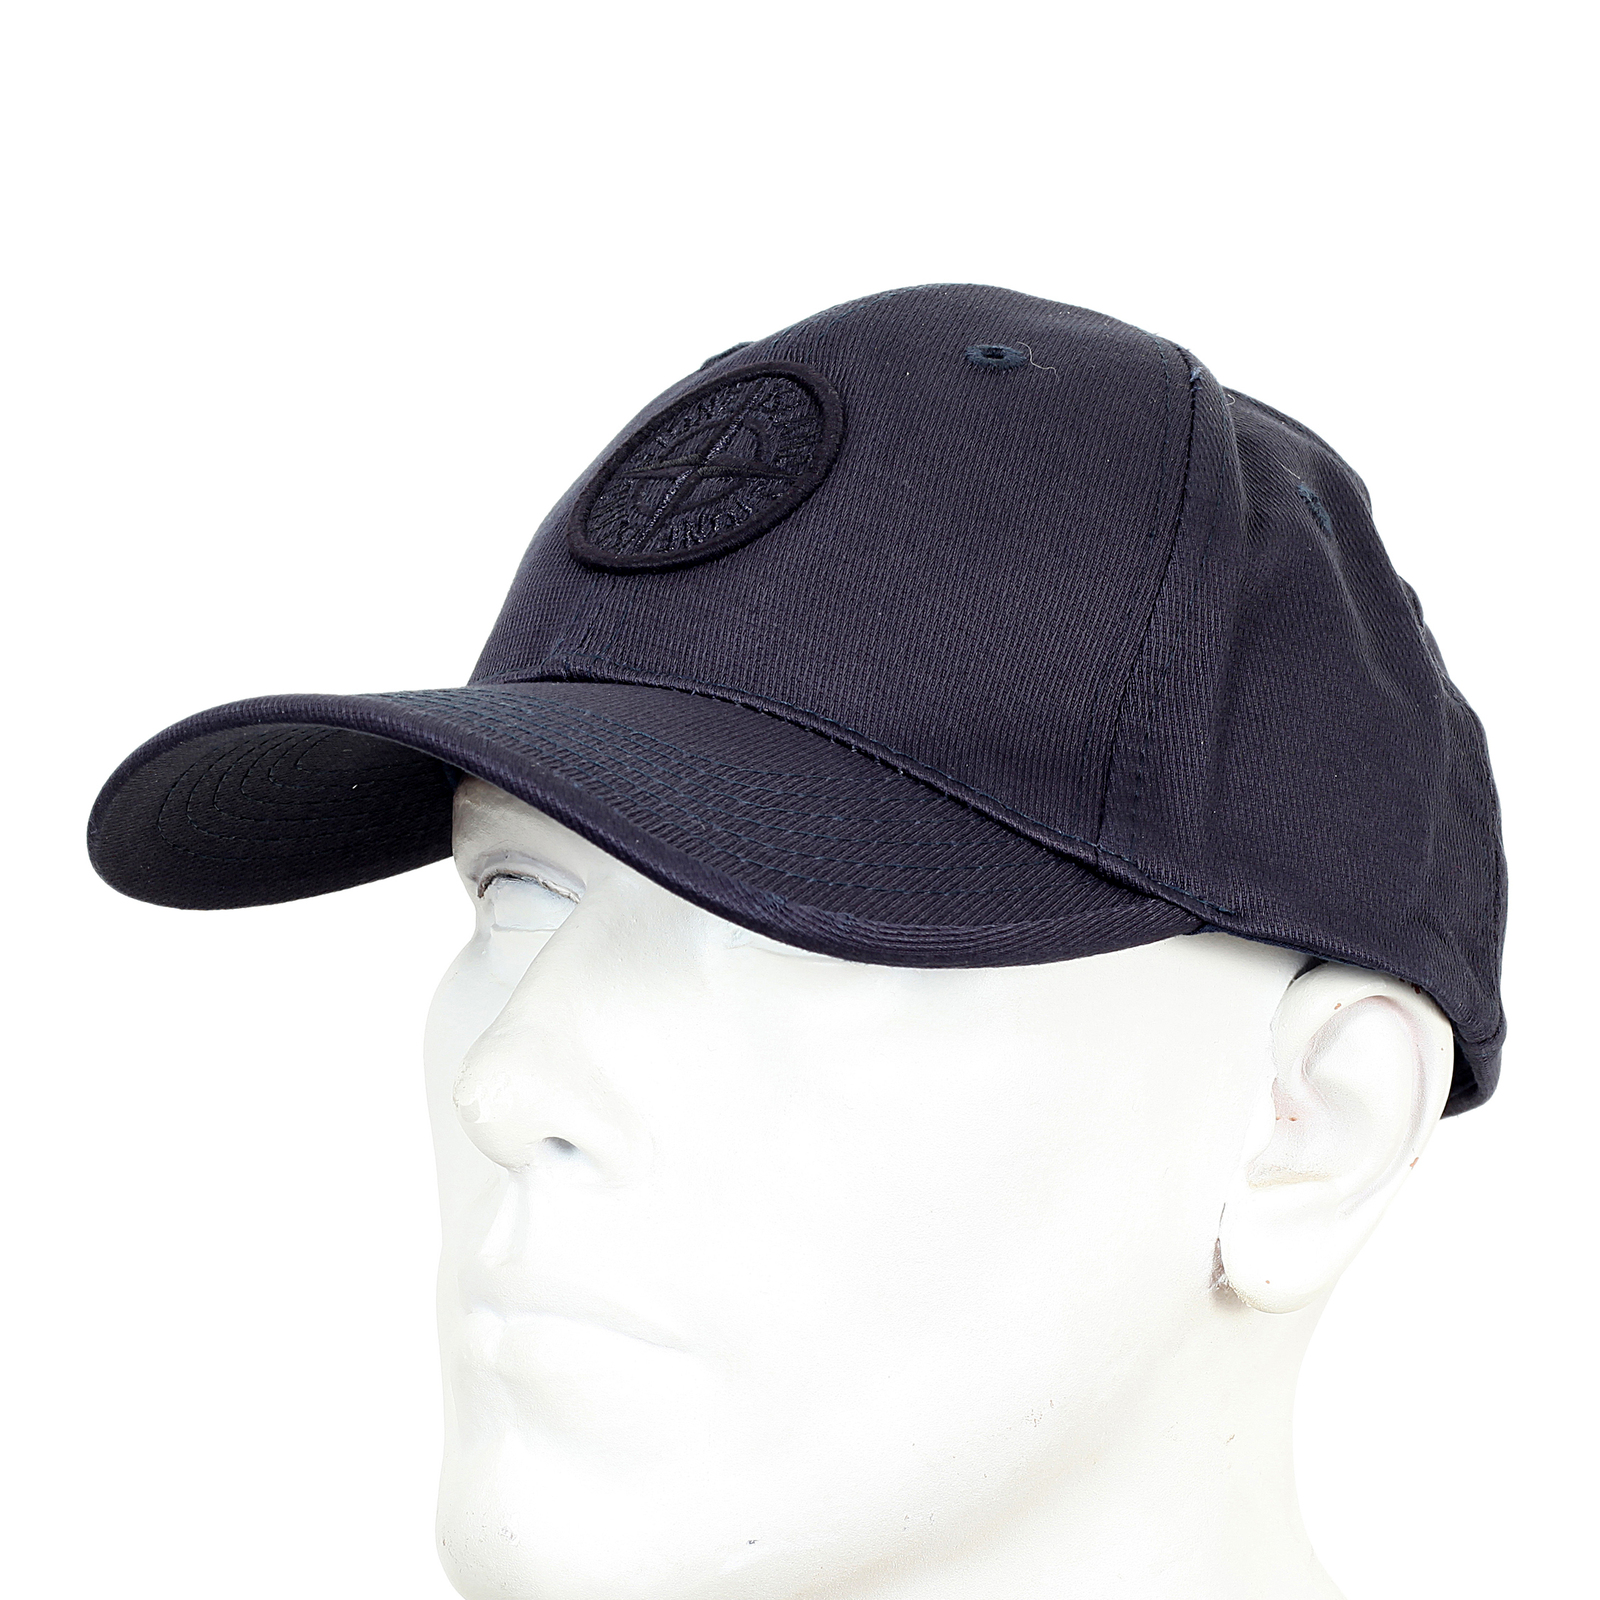 7f5c8de1f7b Stone Island mens navy cotton 611599194 baseball cap SI4078 at Togged  Clothing